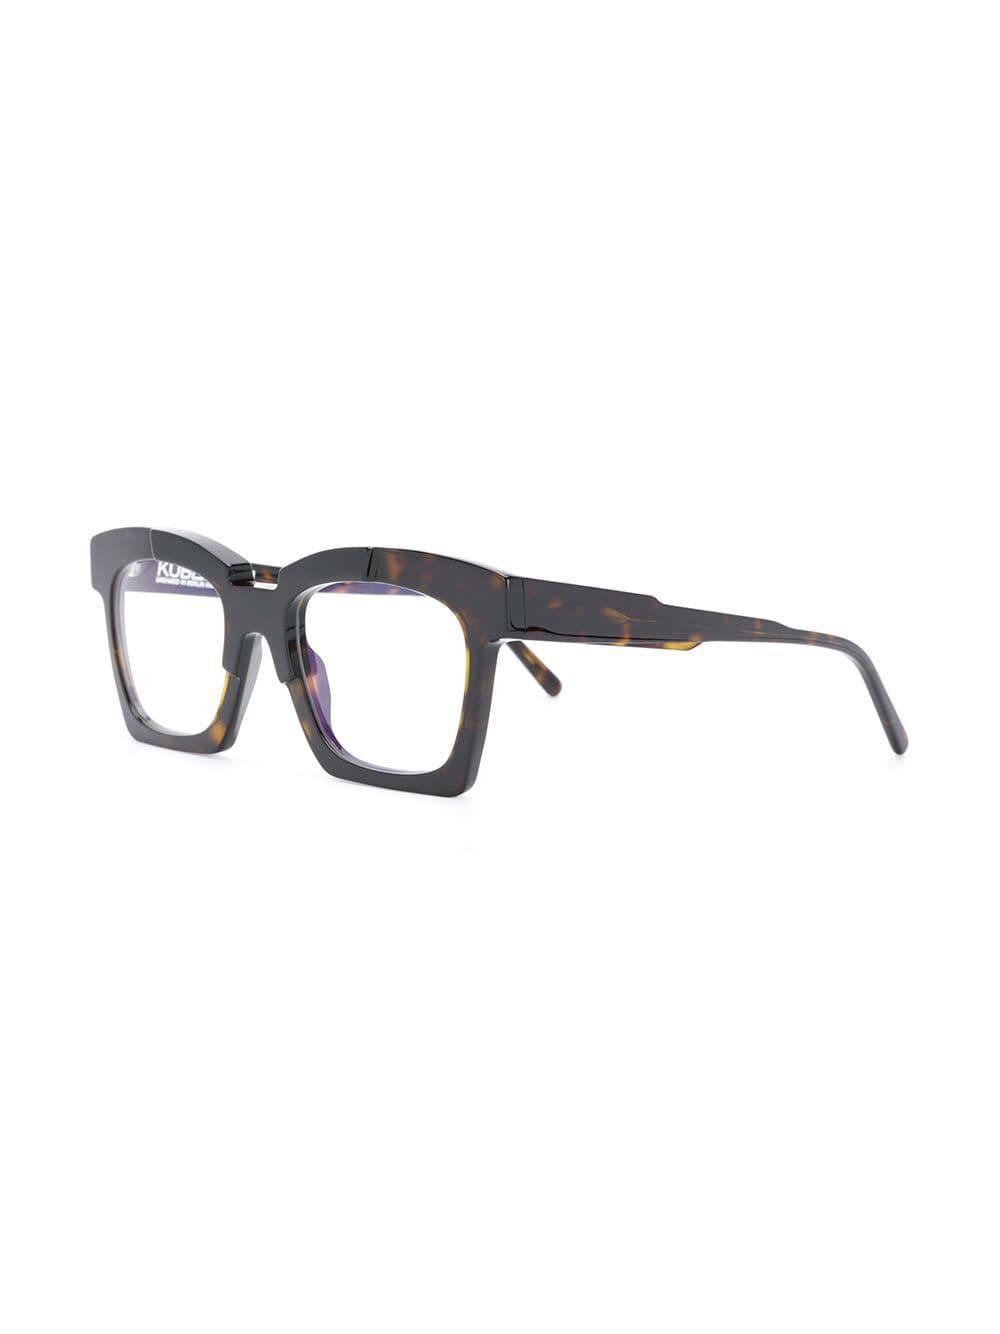 9ac843c8b73 Kuboraum - Brown Square Frame Glasses for Men - Lyst. View fullscreen